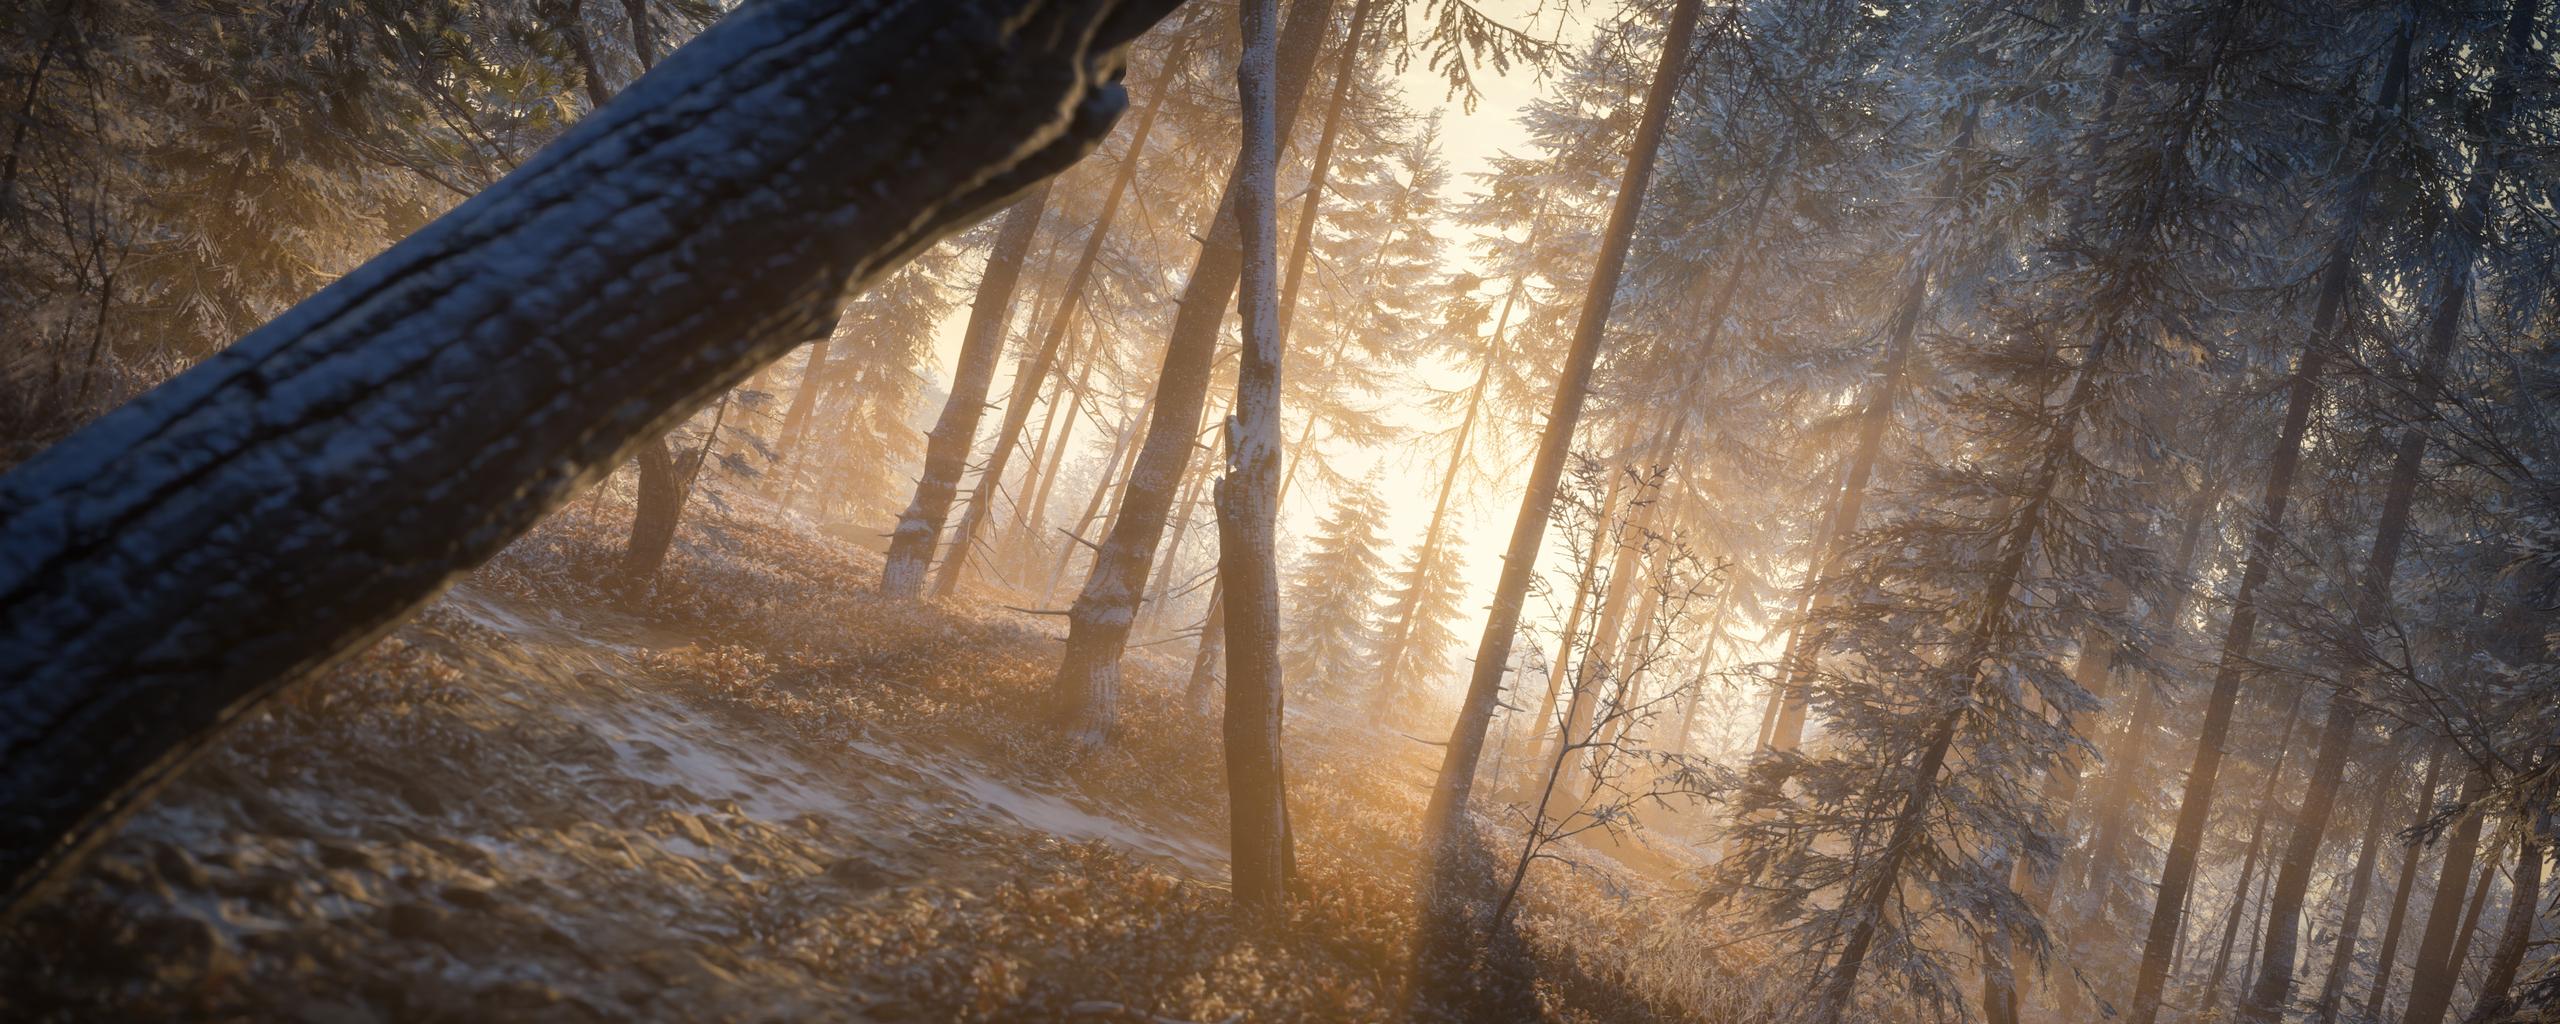 last-rays-of-sun-evening-in-forest-4k-x6.jpg